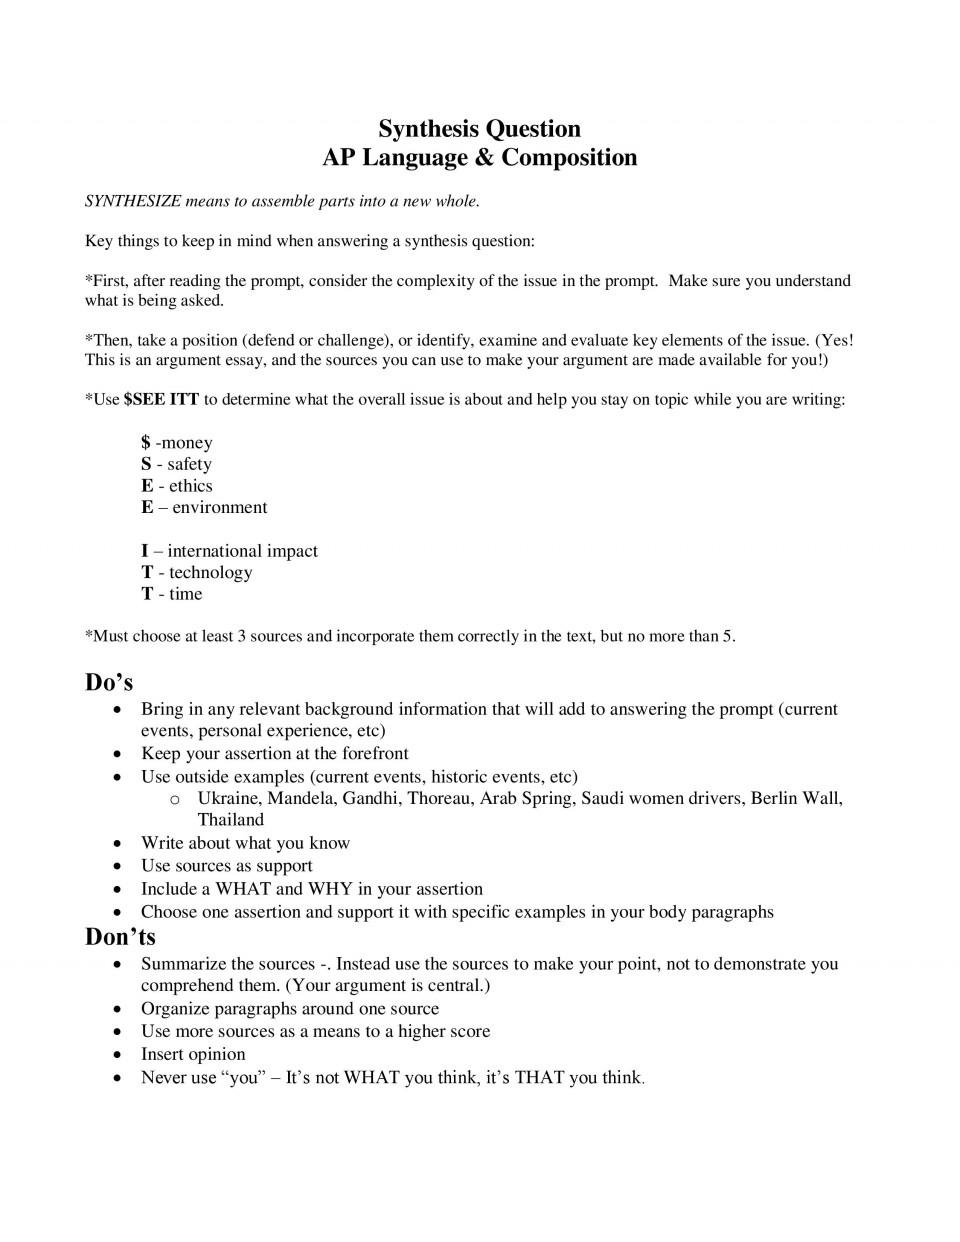 Pillsbury cookie challenge case study summary